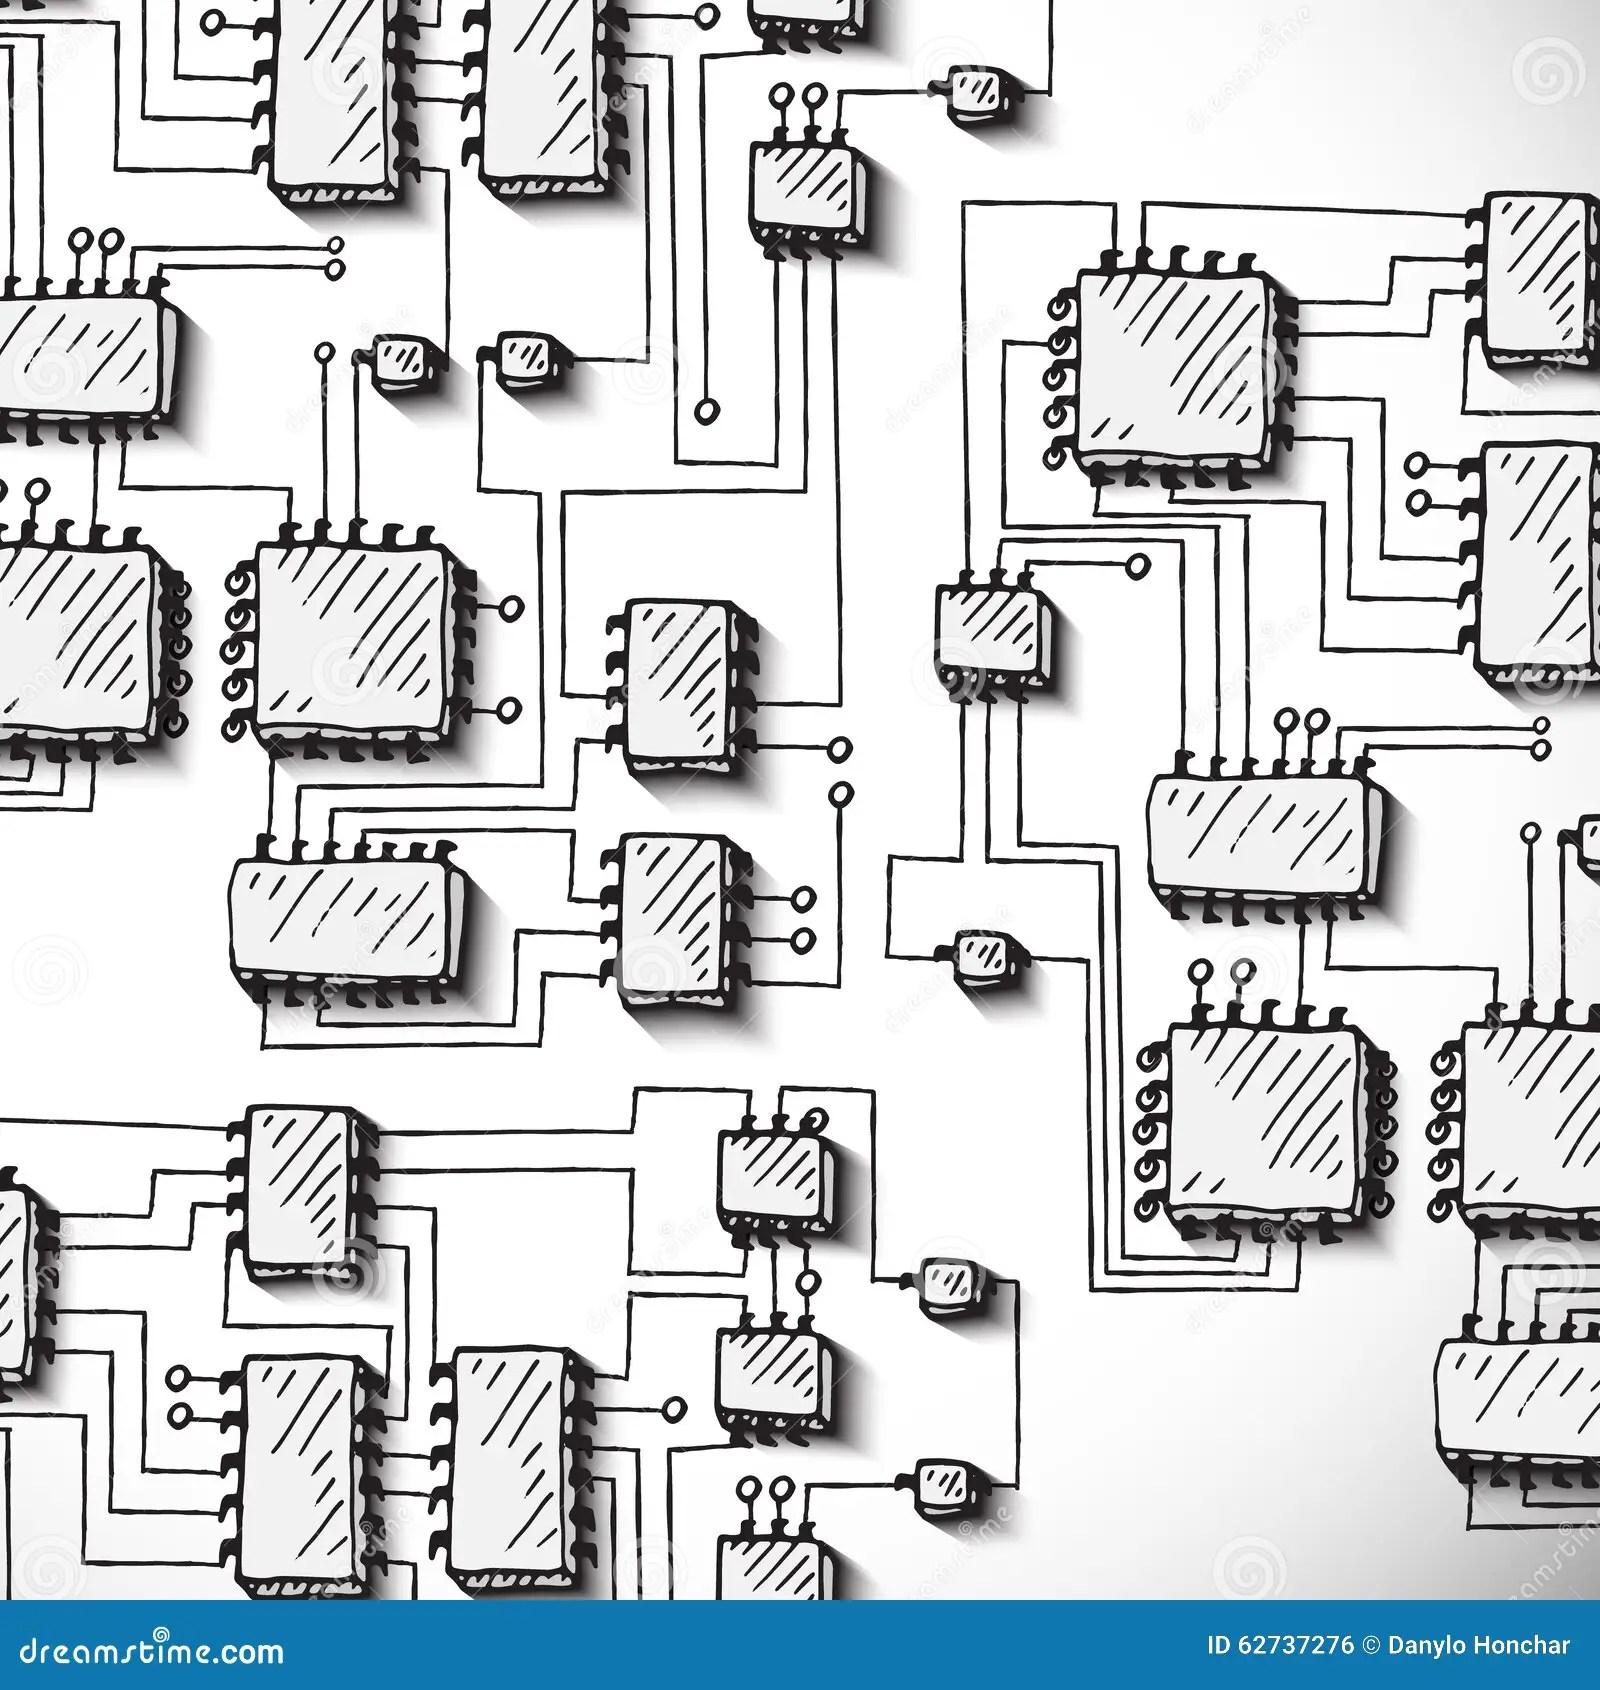 circuit diagram vector wiring diagram database. Black Bedroom Furniture Sets. Home Design Ideas